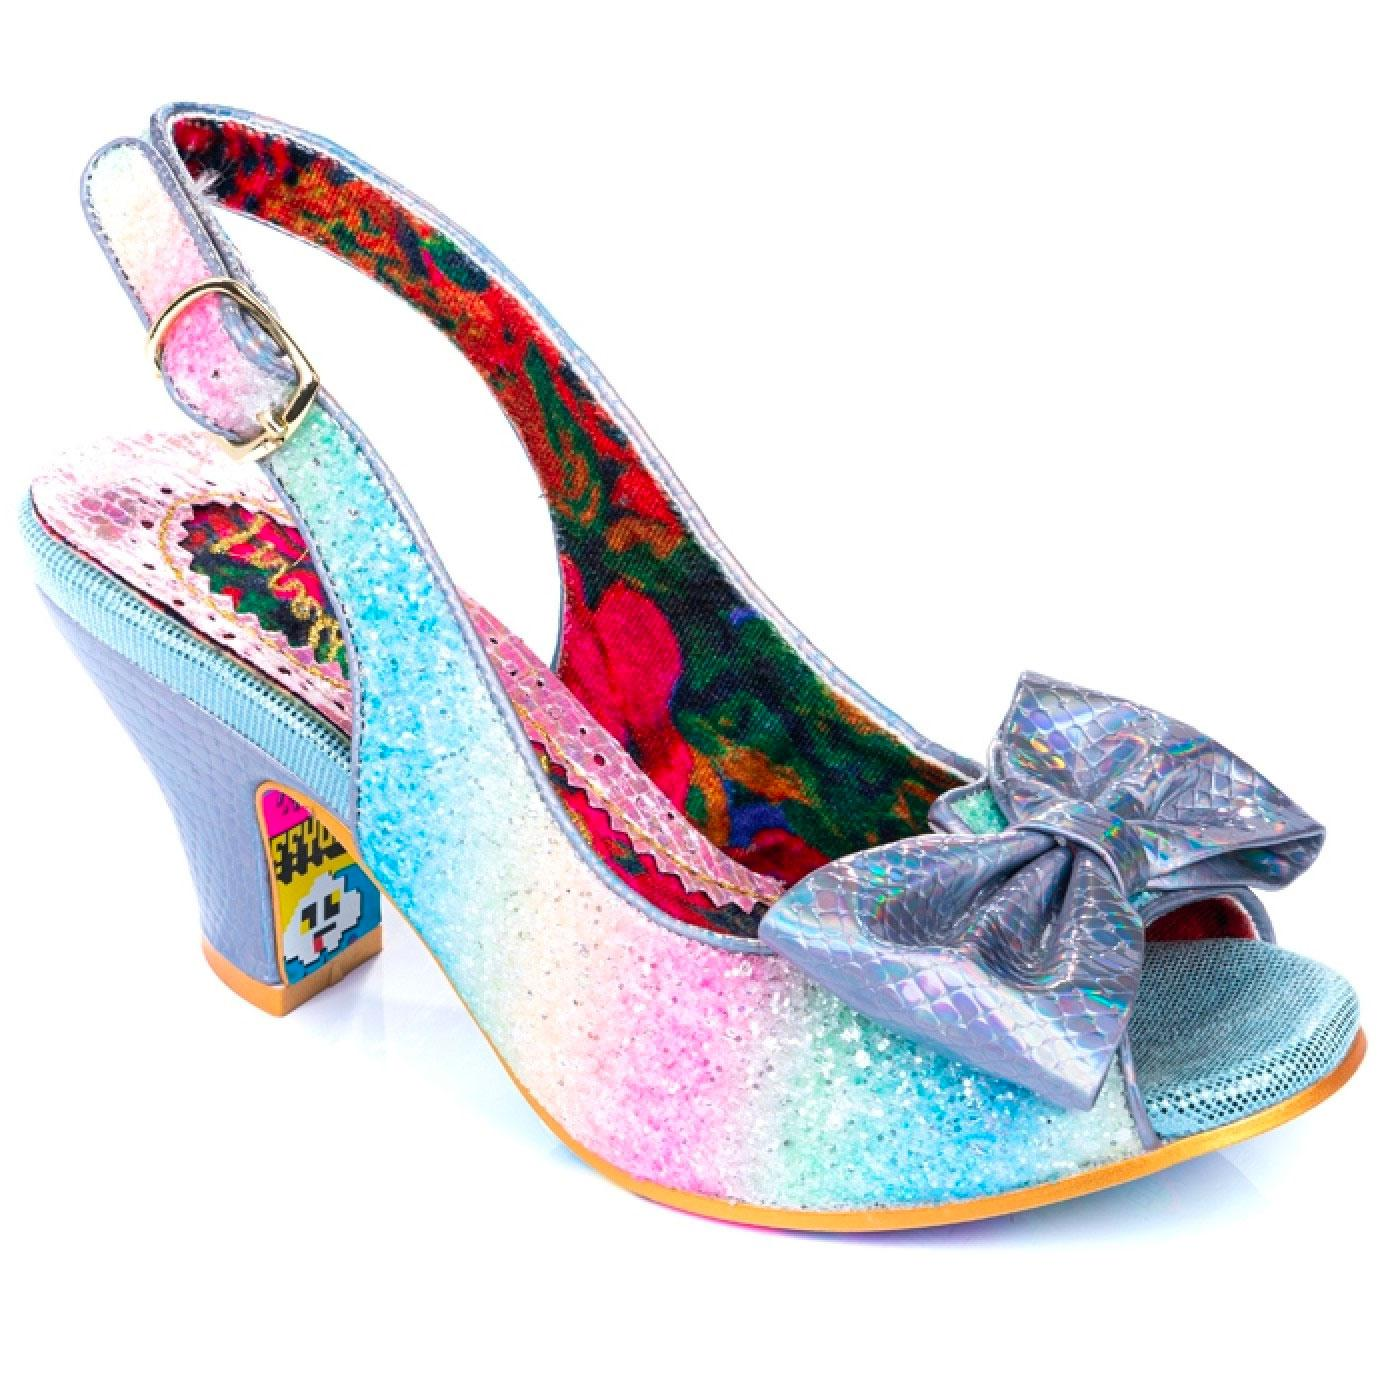 Hiya Synth IRREGULAR CHOICE Rainbow Heels BLUE